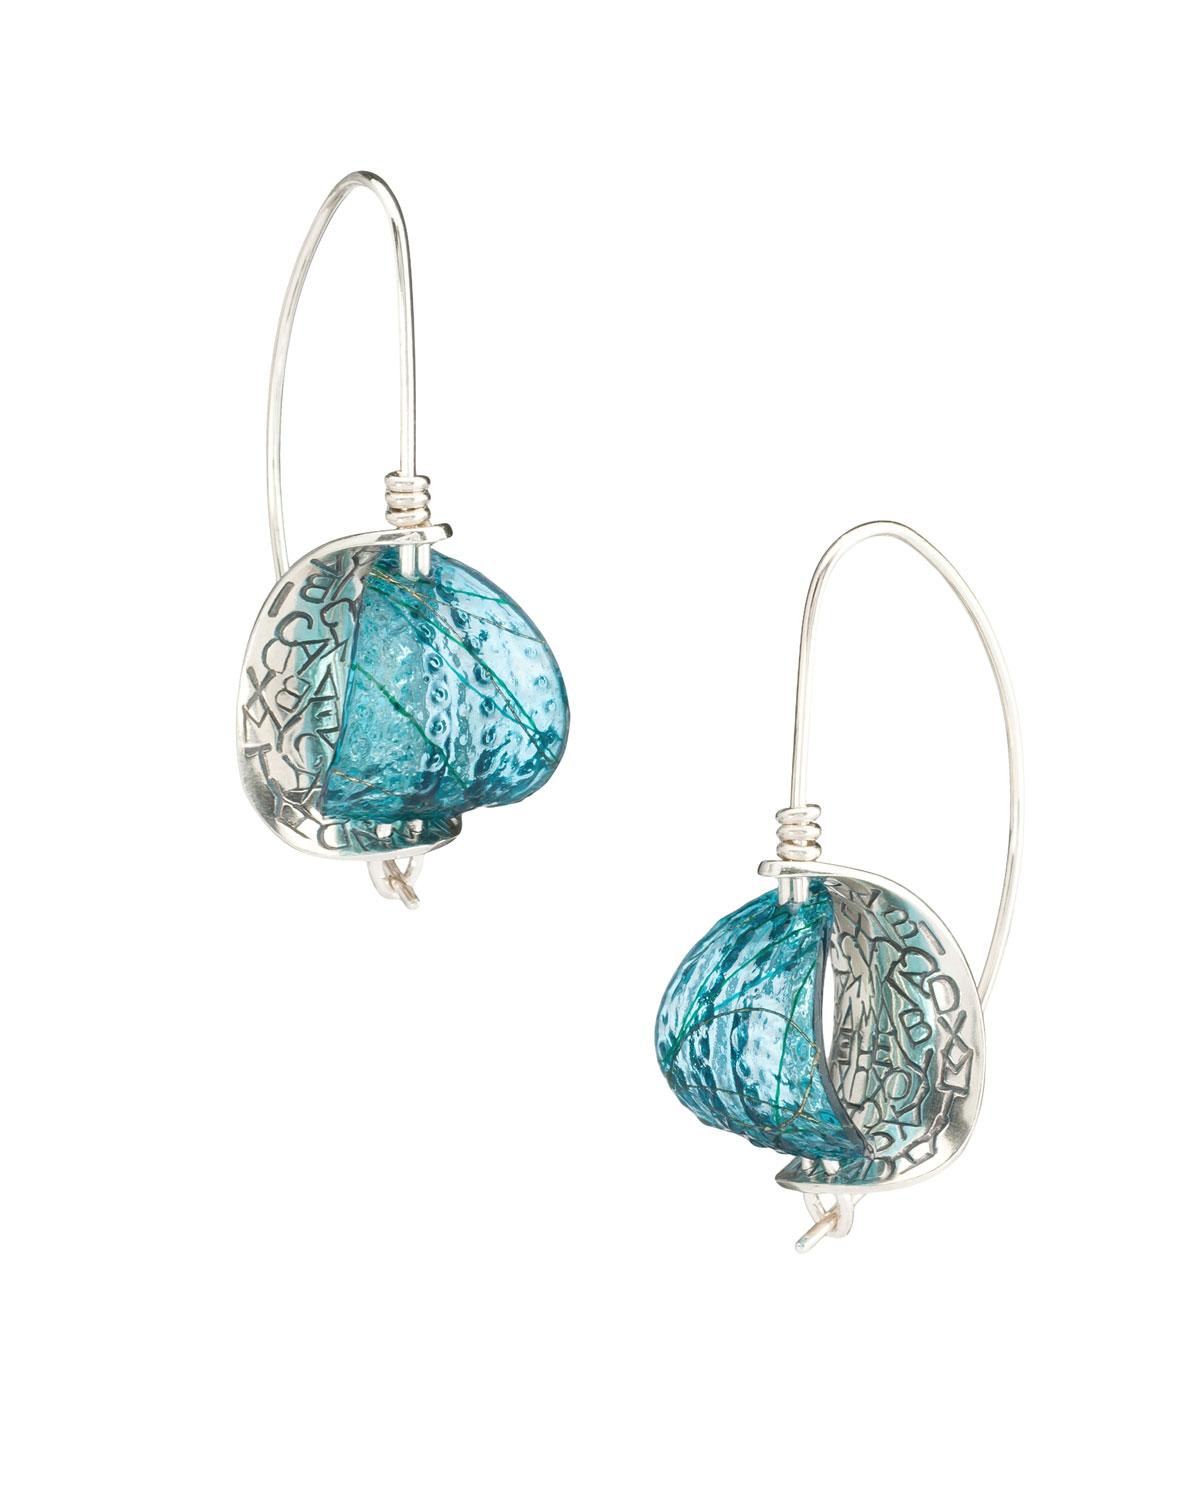 Retroflex - Earrings (small)Silver, dyed resin, thread4.2H x 1.6W x 2.5D cm